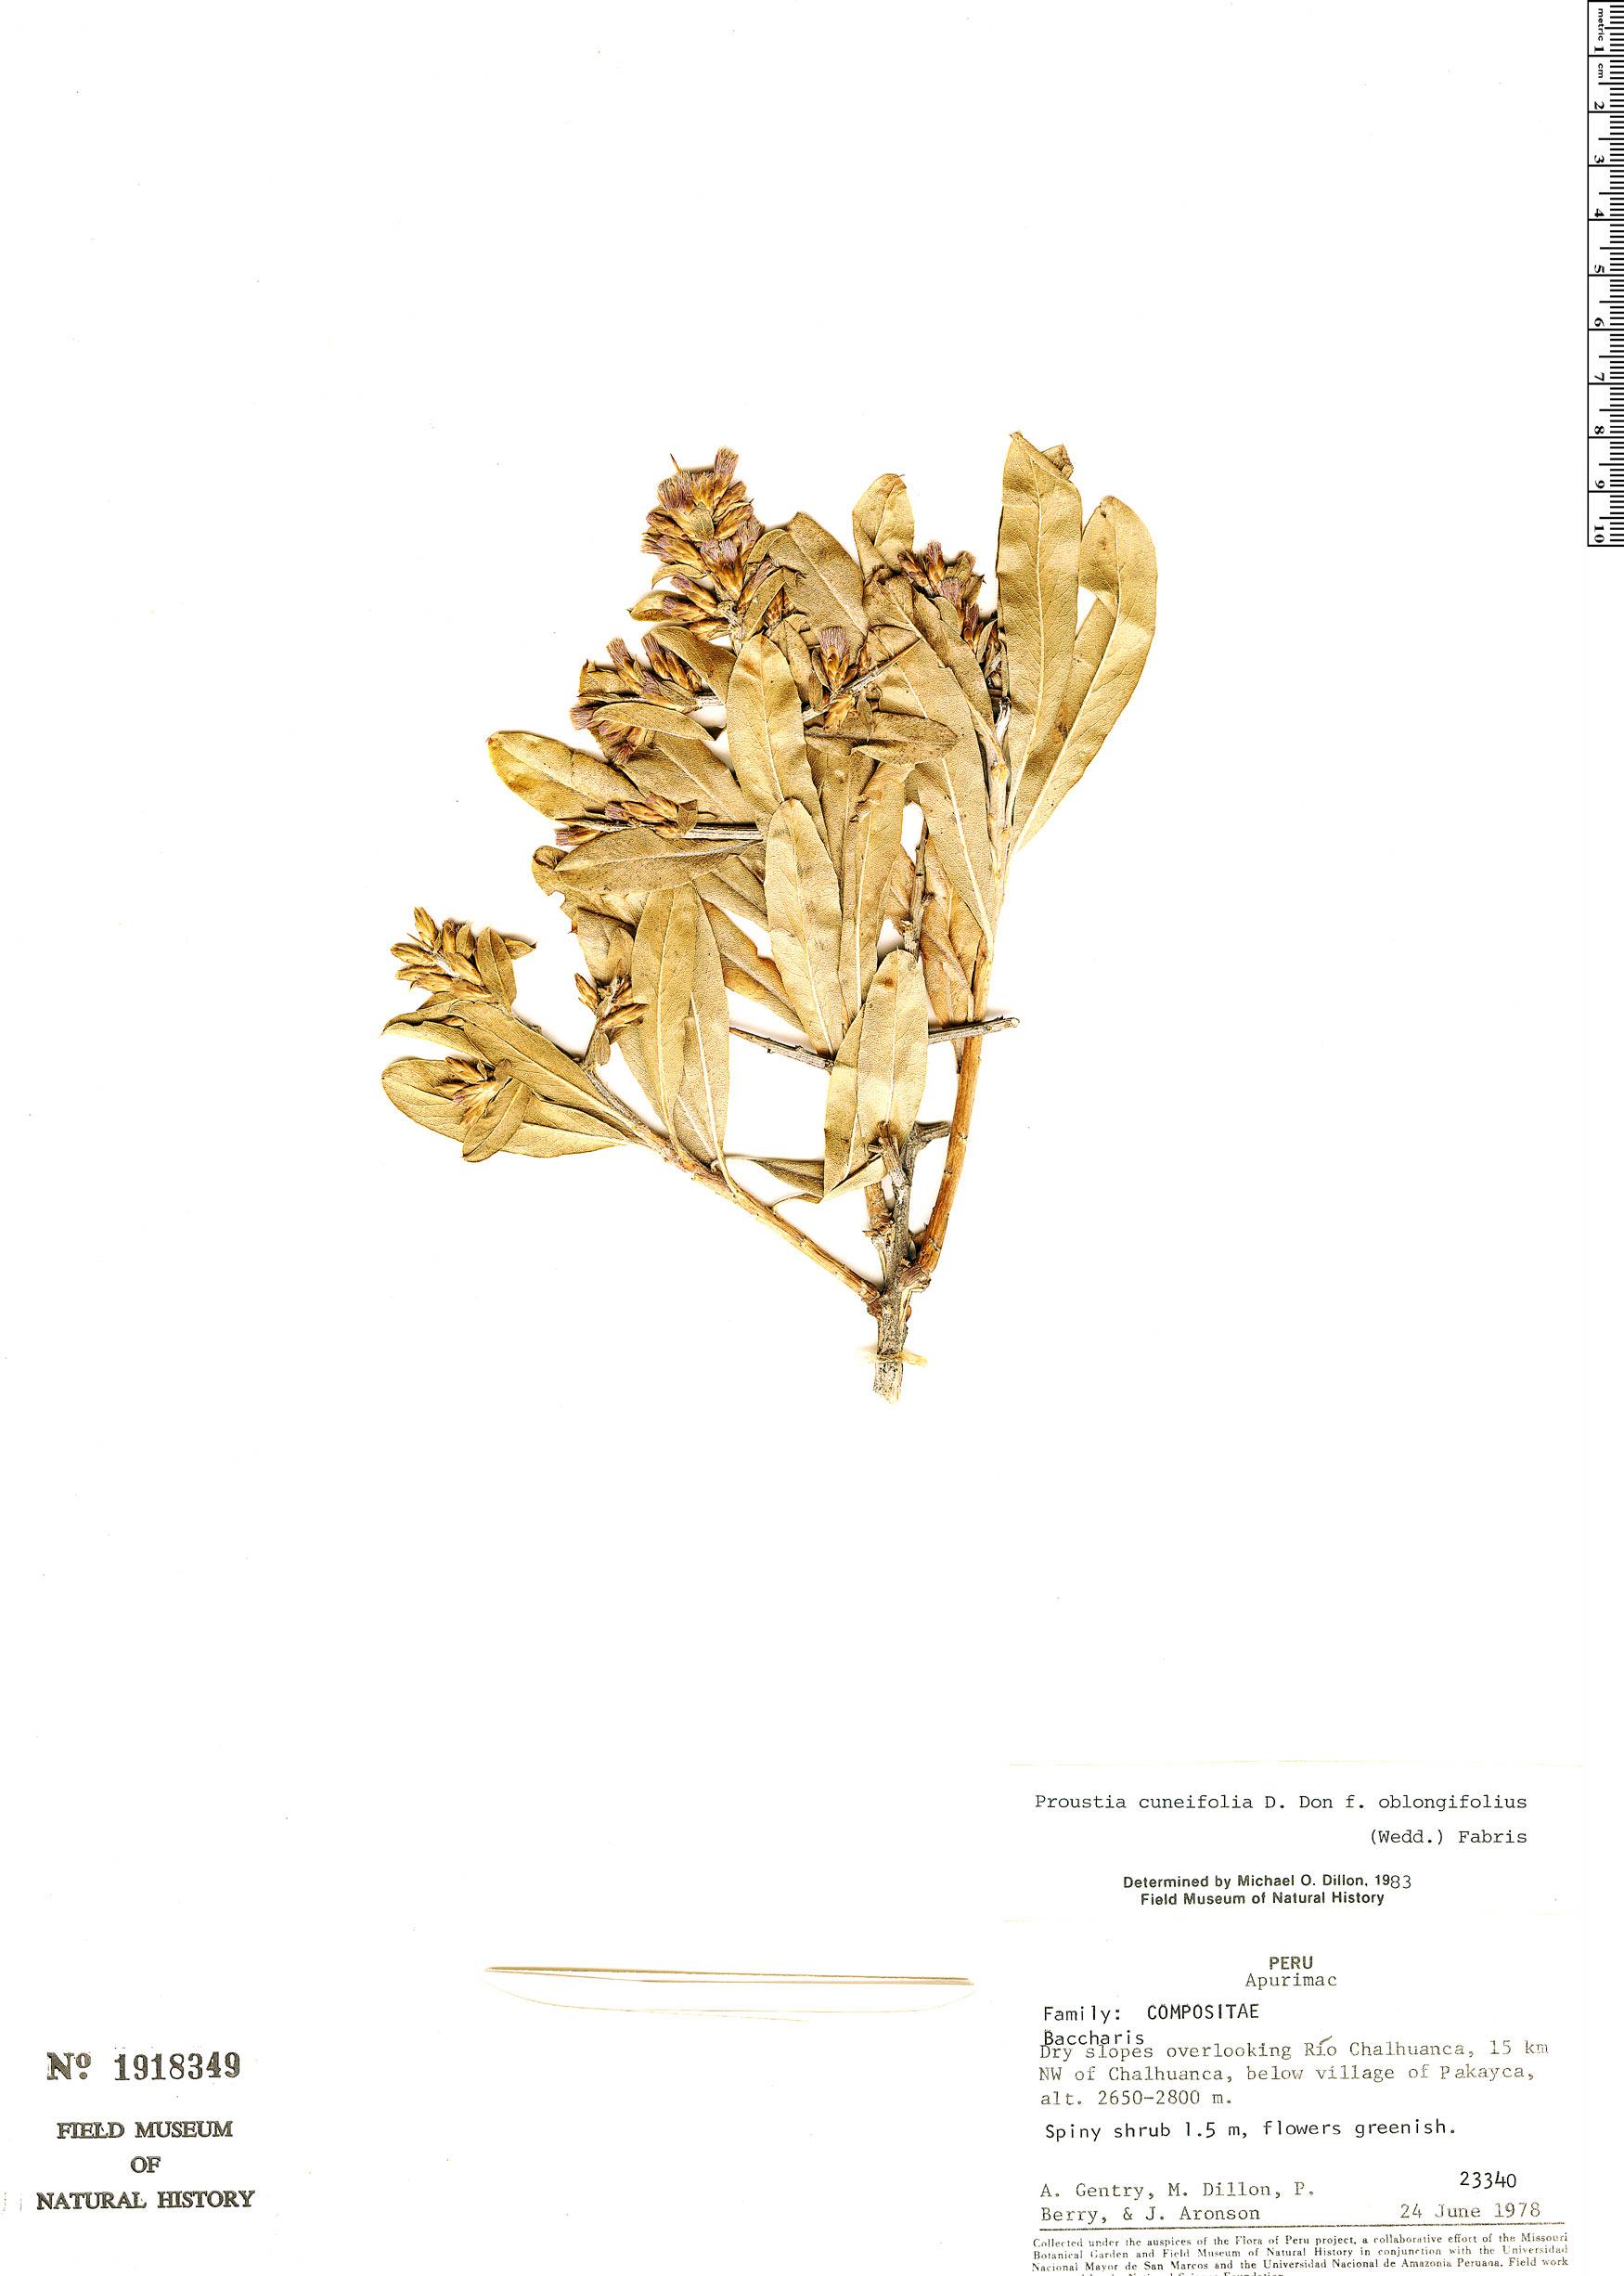 Specimen: Proustia cuneifolia